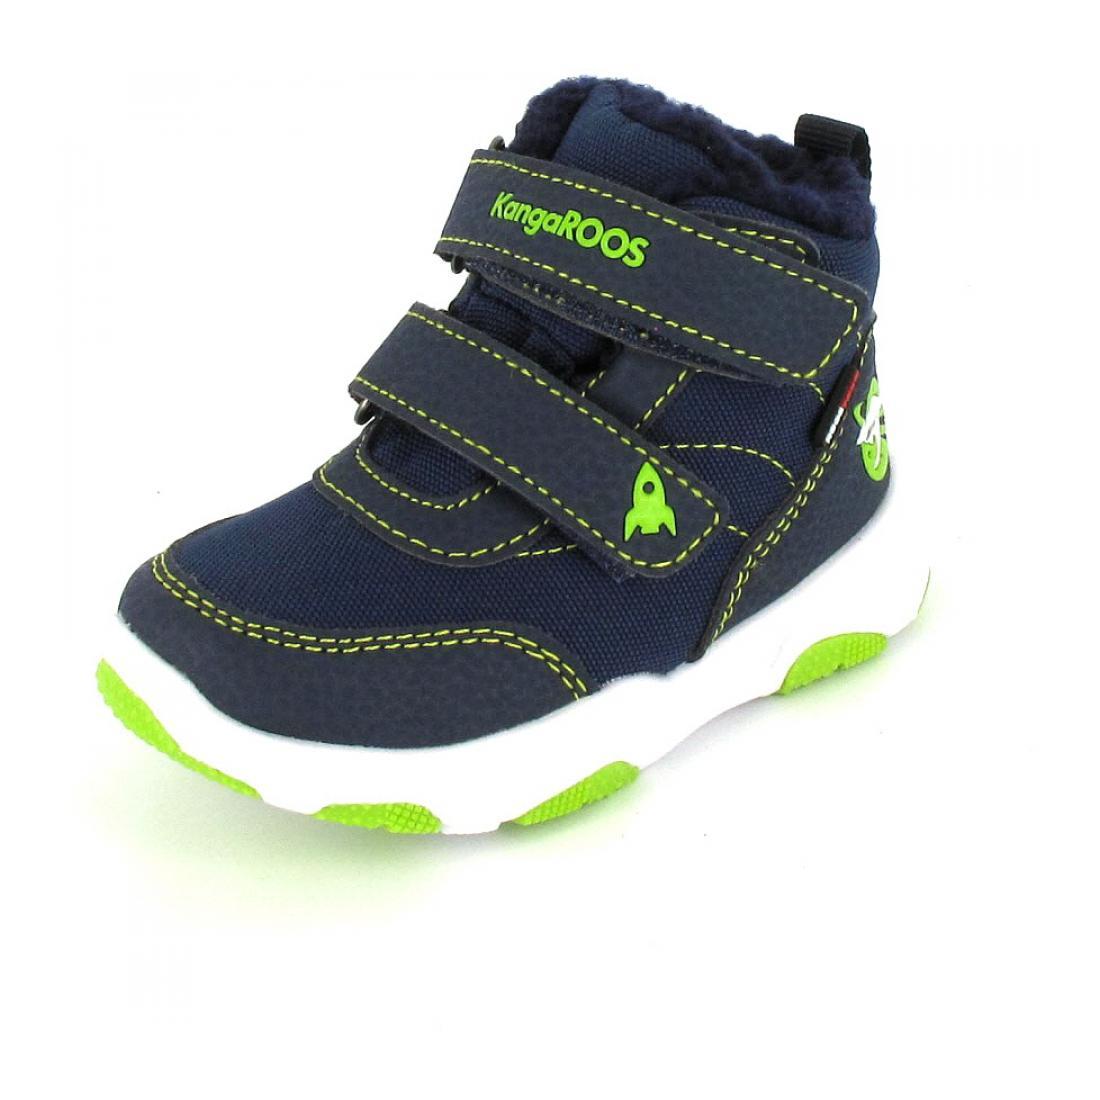 KangaRoos Boots KS-Abe V RTX